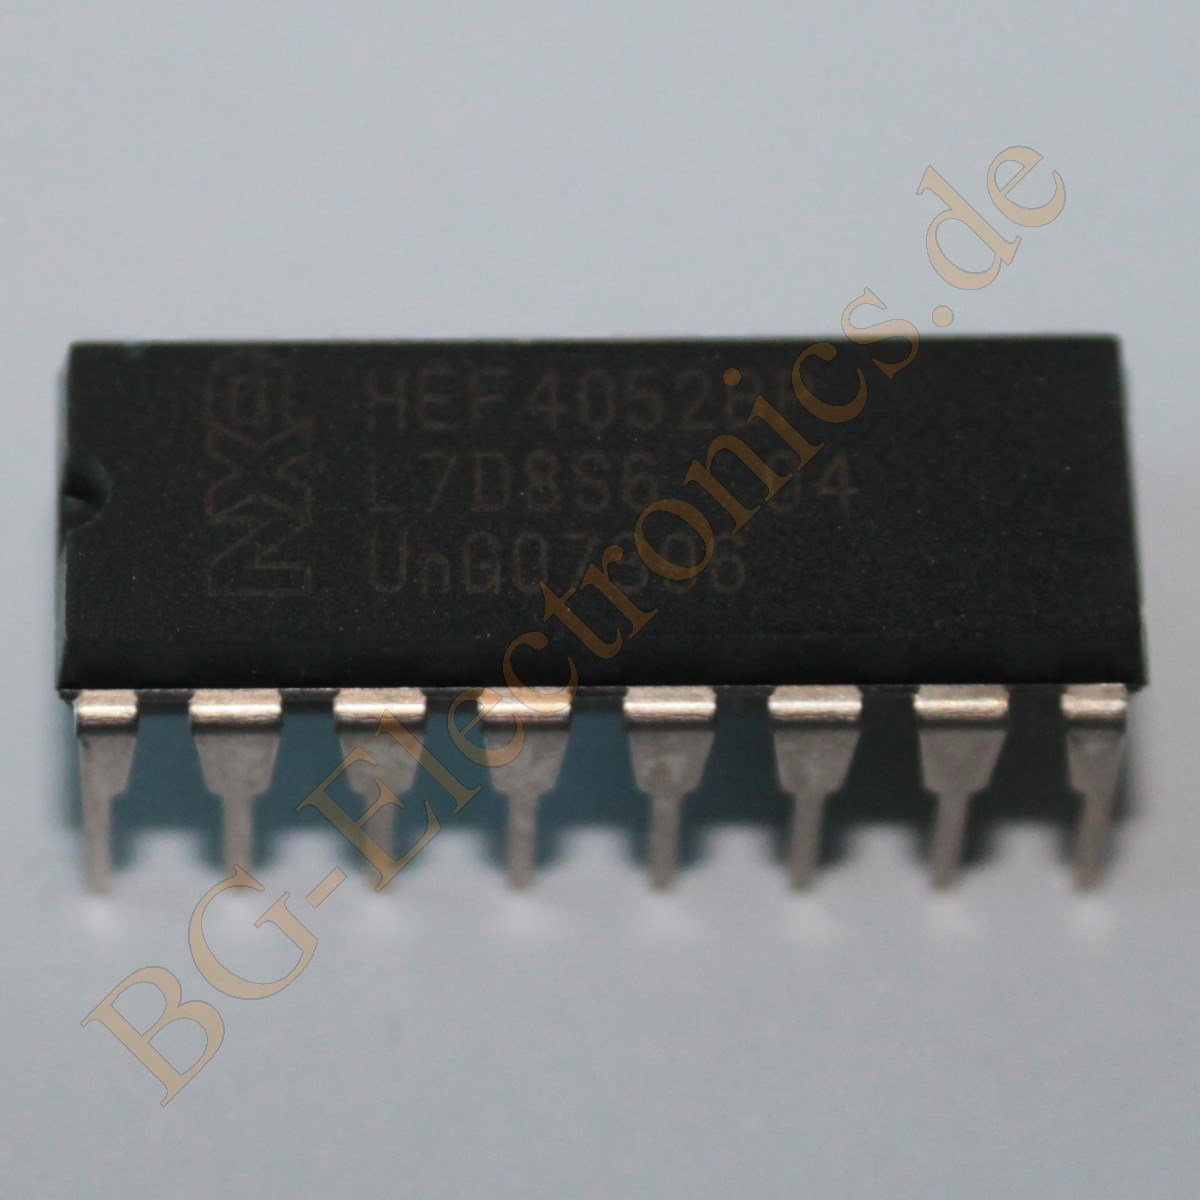 2 X MX-1545-R1 Enchufe Molex 003091022 03-09-1022 1545-R1 Macho//Hembra cable